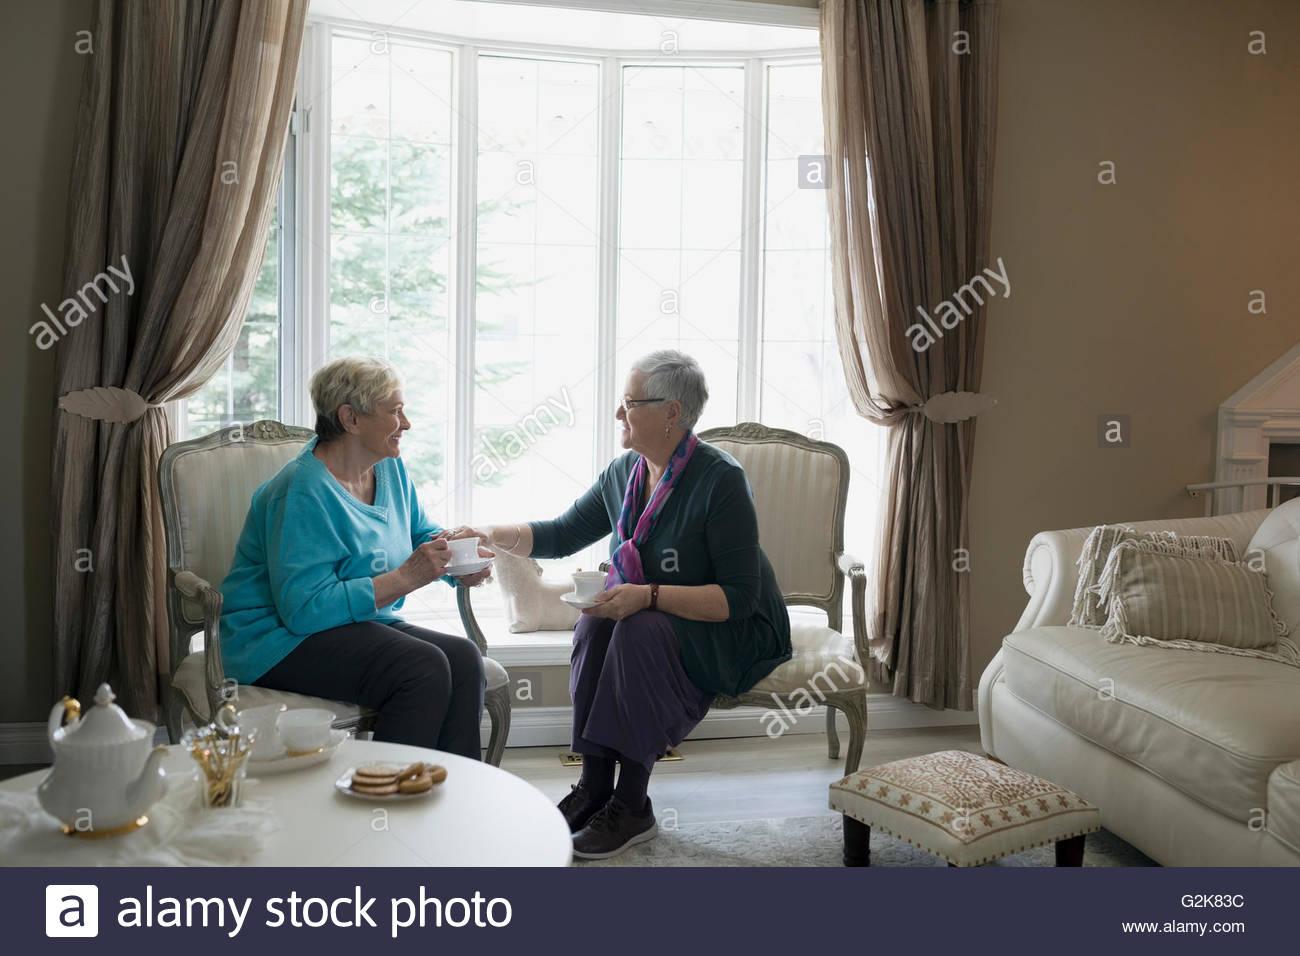 Senior women drinking tea and talking in living room - Stock Image